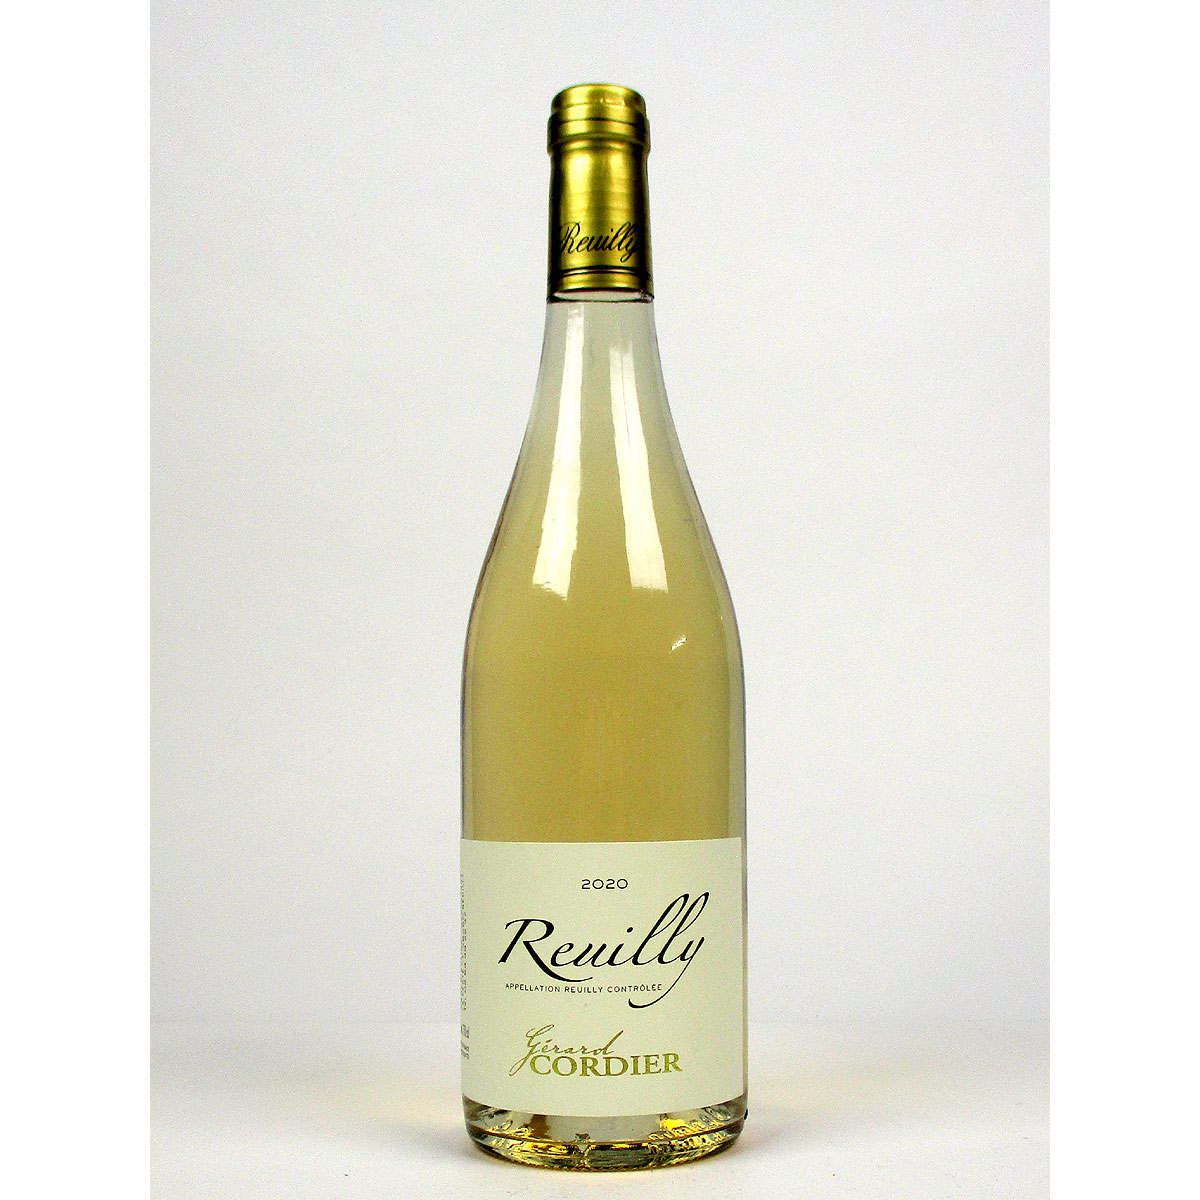 Reuilly: Gerard Cordier Pinot Gris 2020 - Bottle